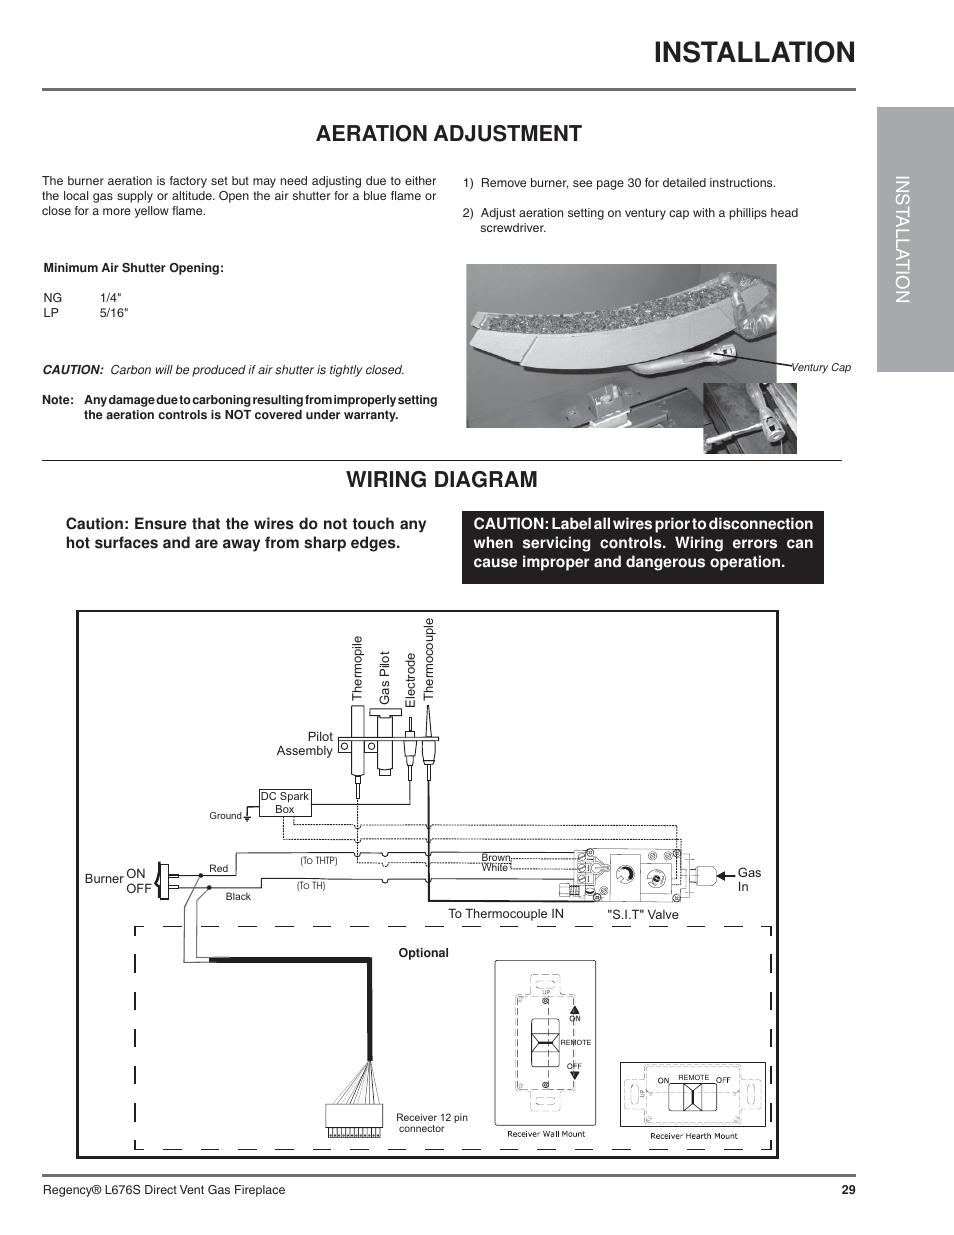 hight resolution of installation wiring diagram aeration adjustment inst alla tion regency sunrise gas fireplace